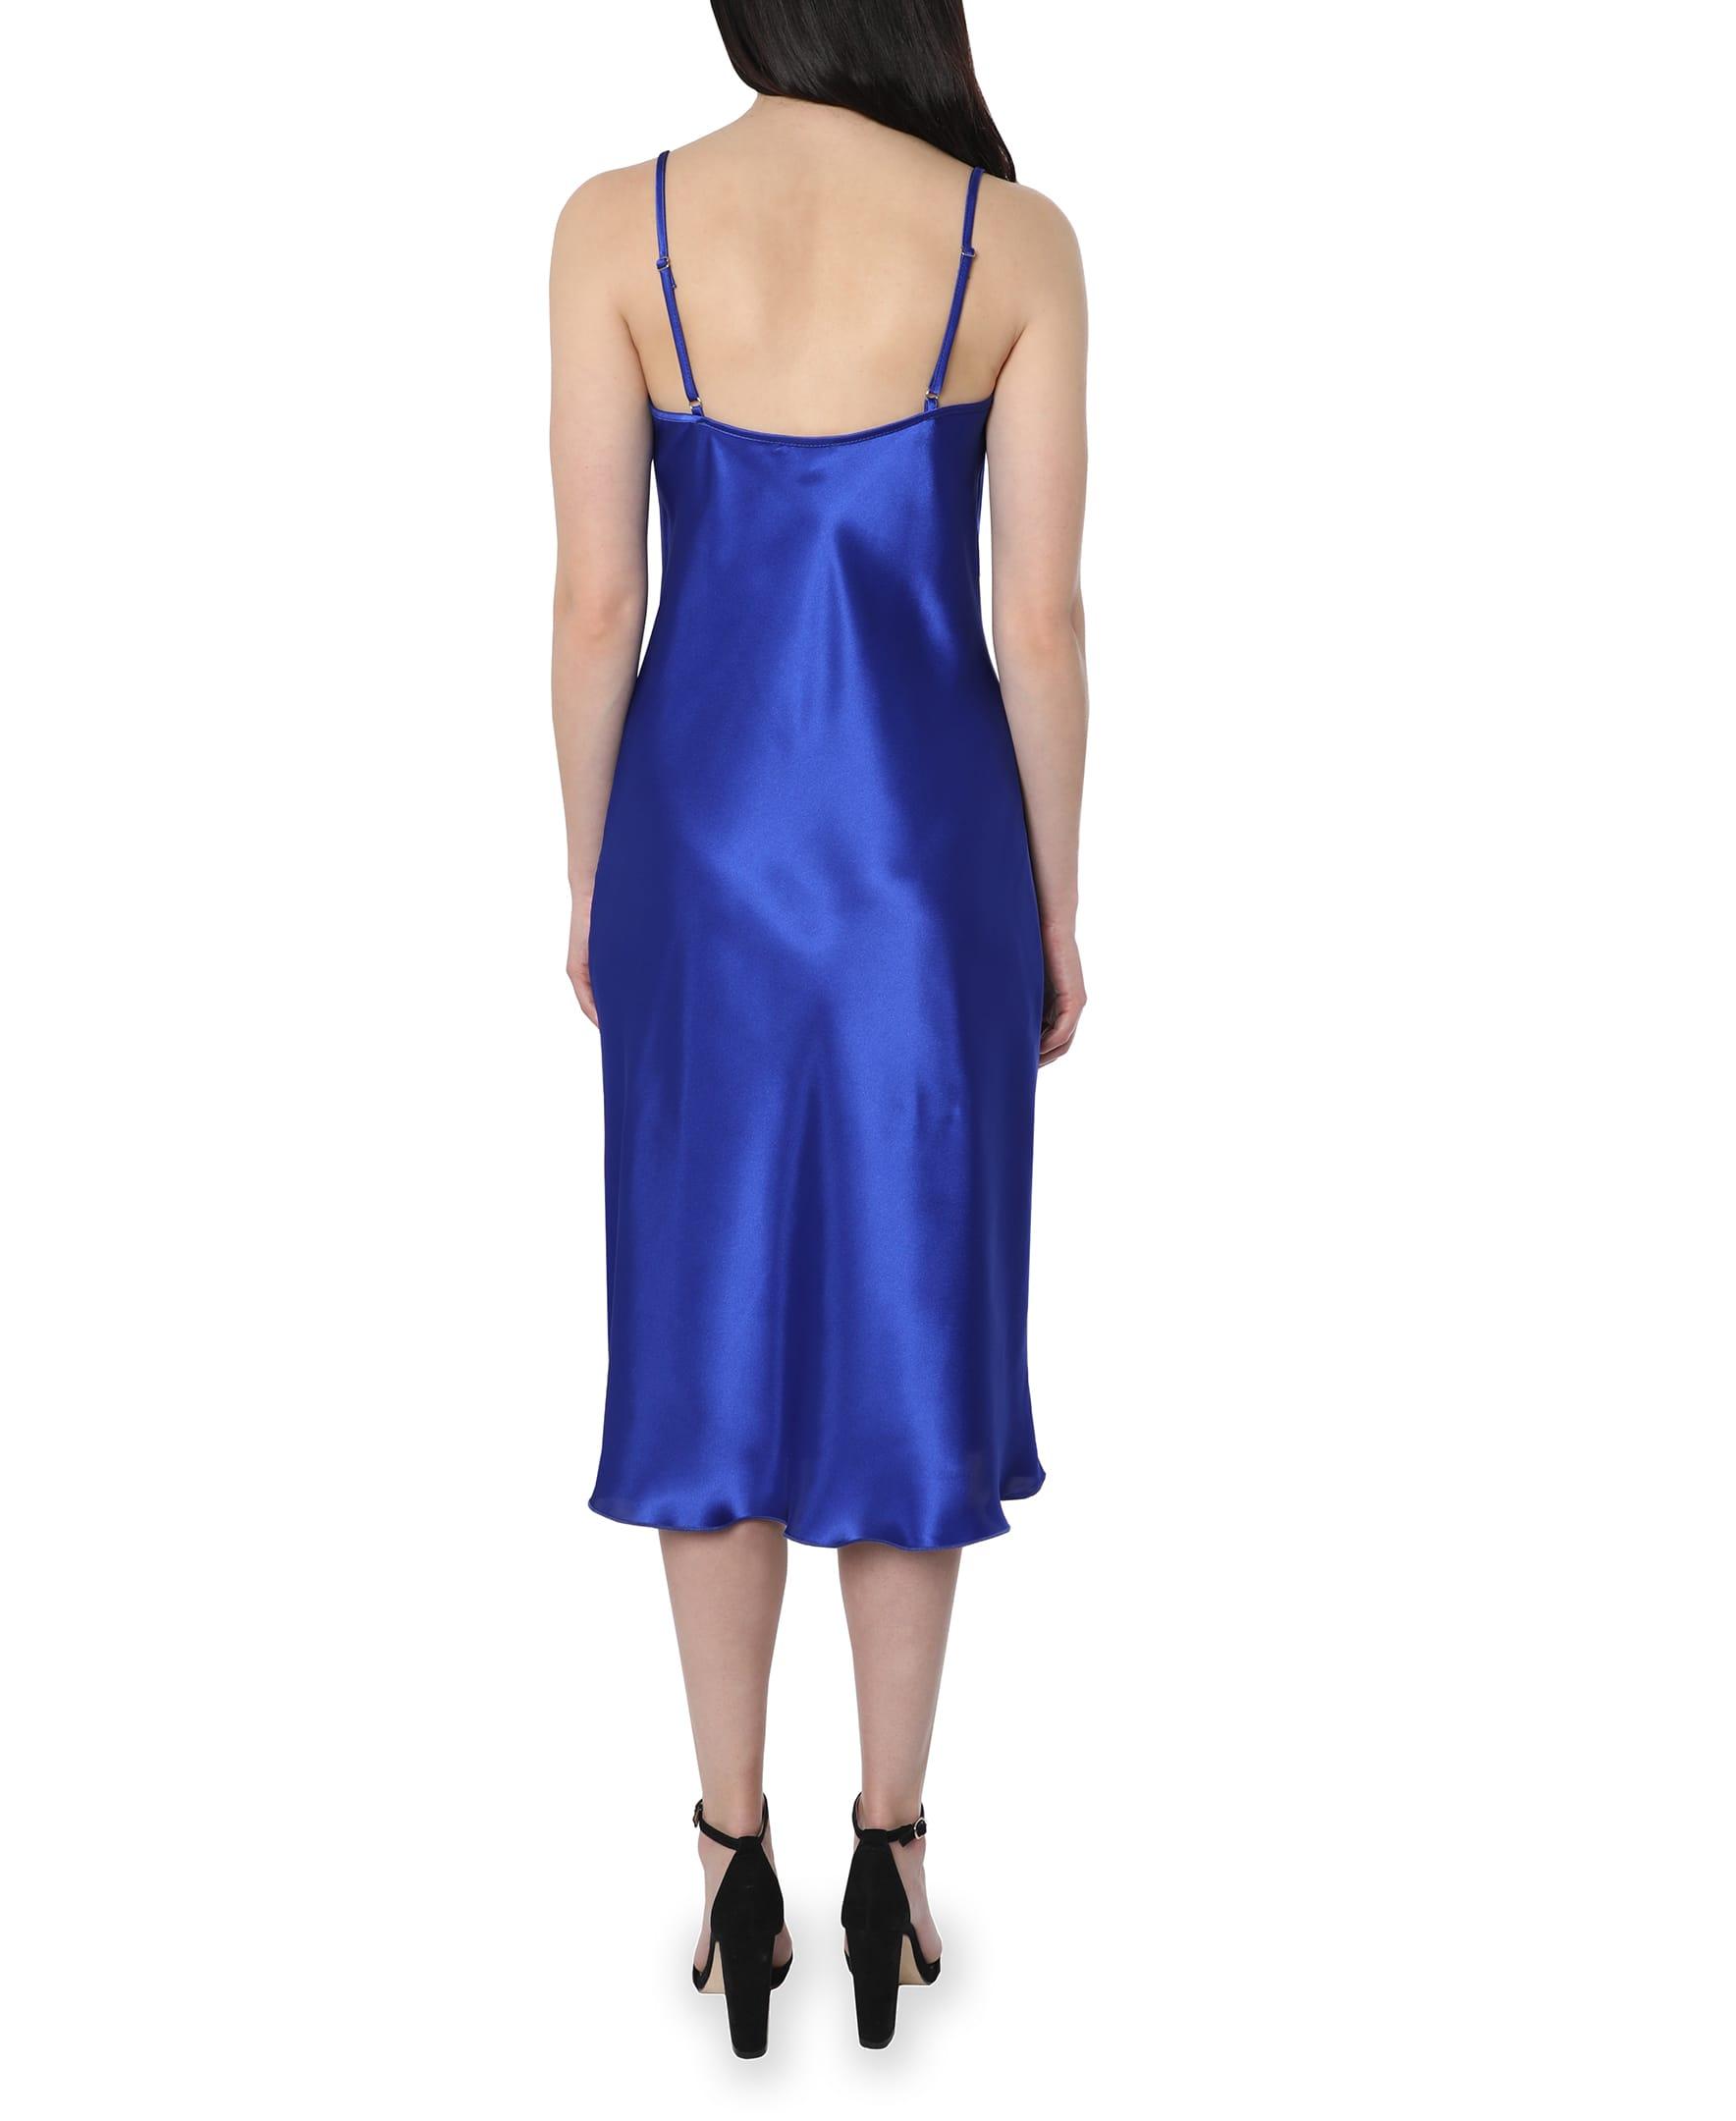 Bebe Satin Midi Dress - cobalt - Back